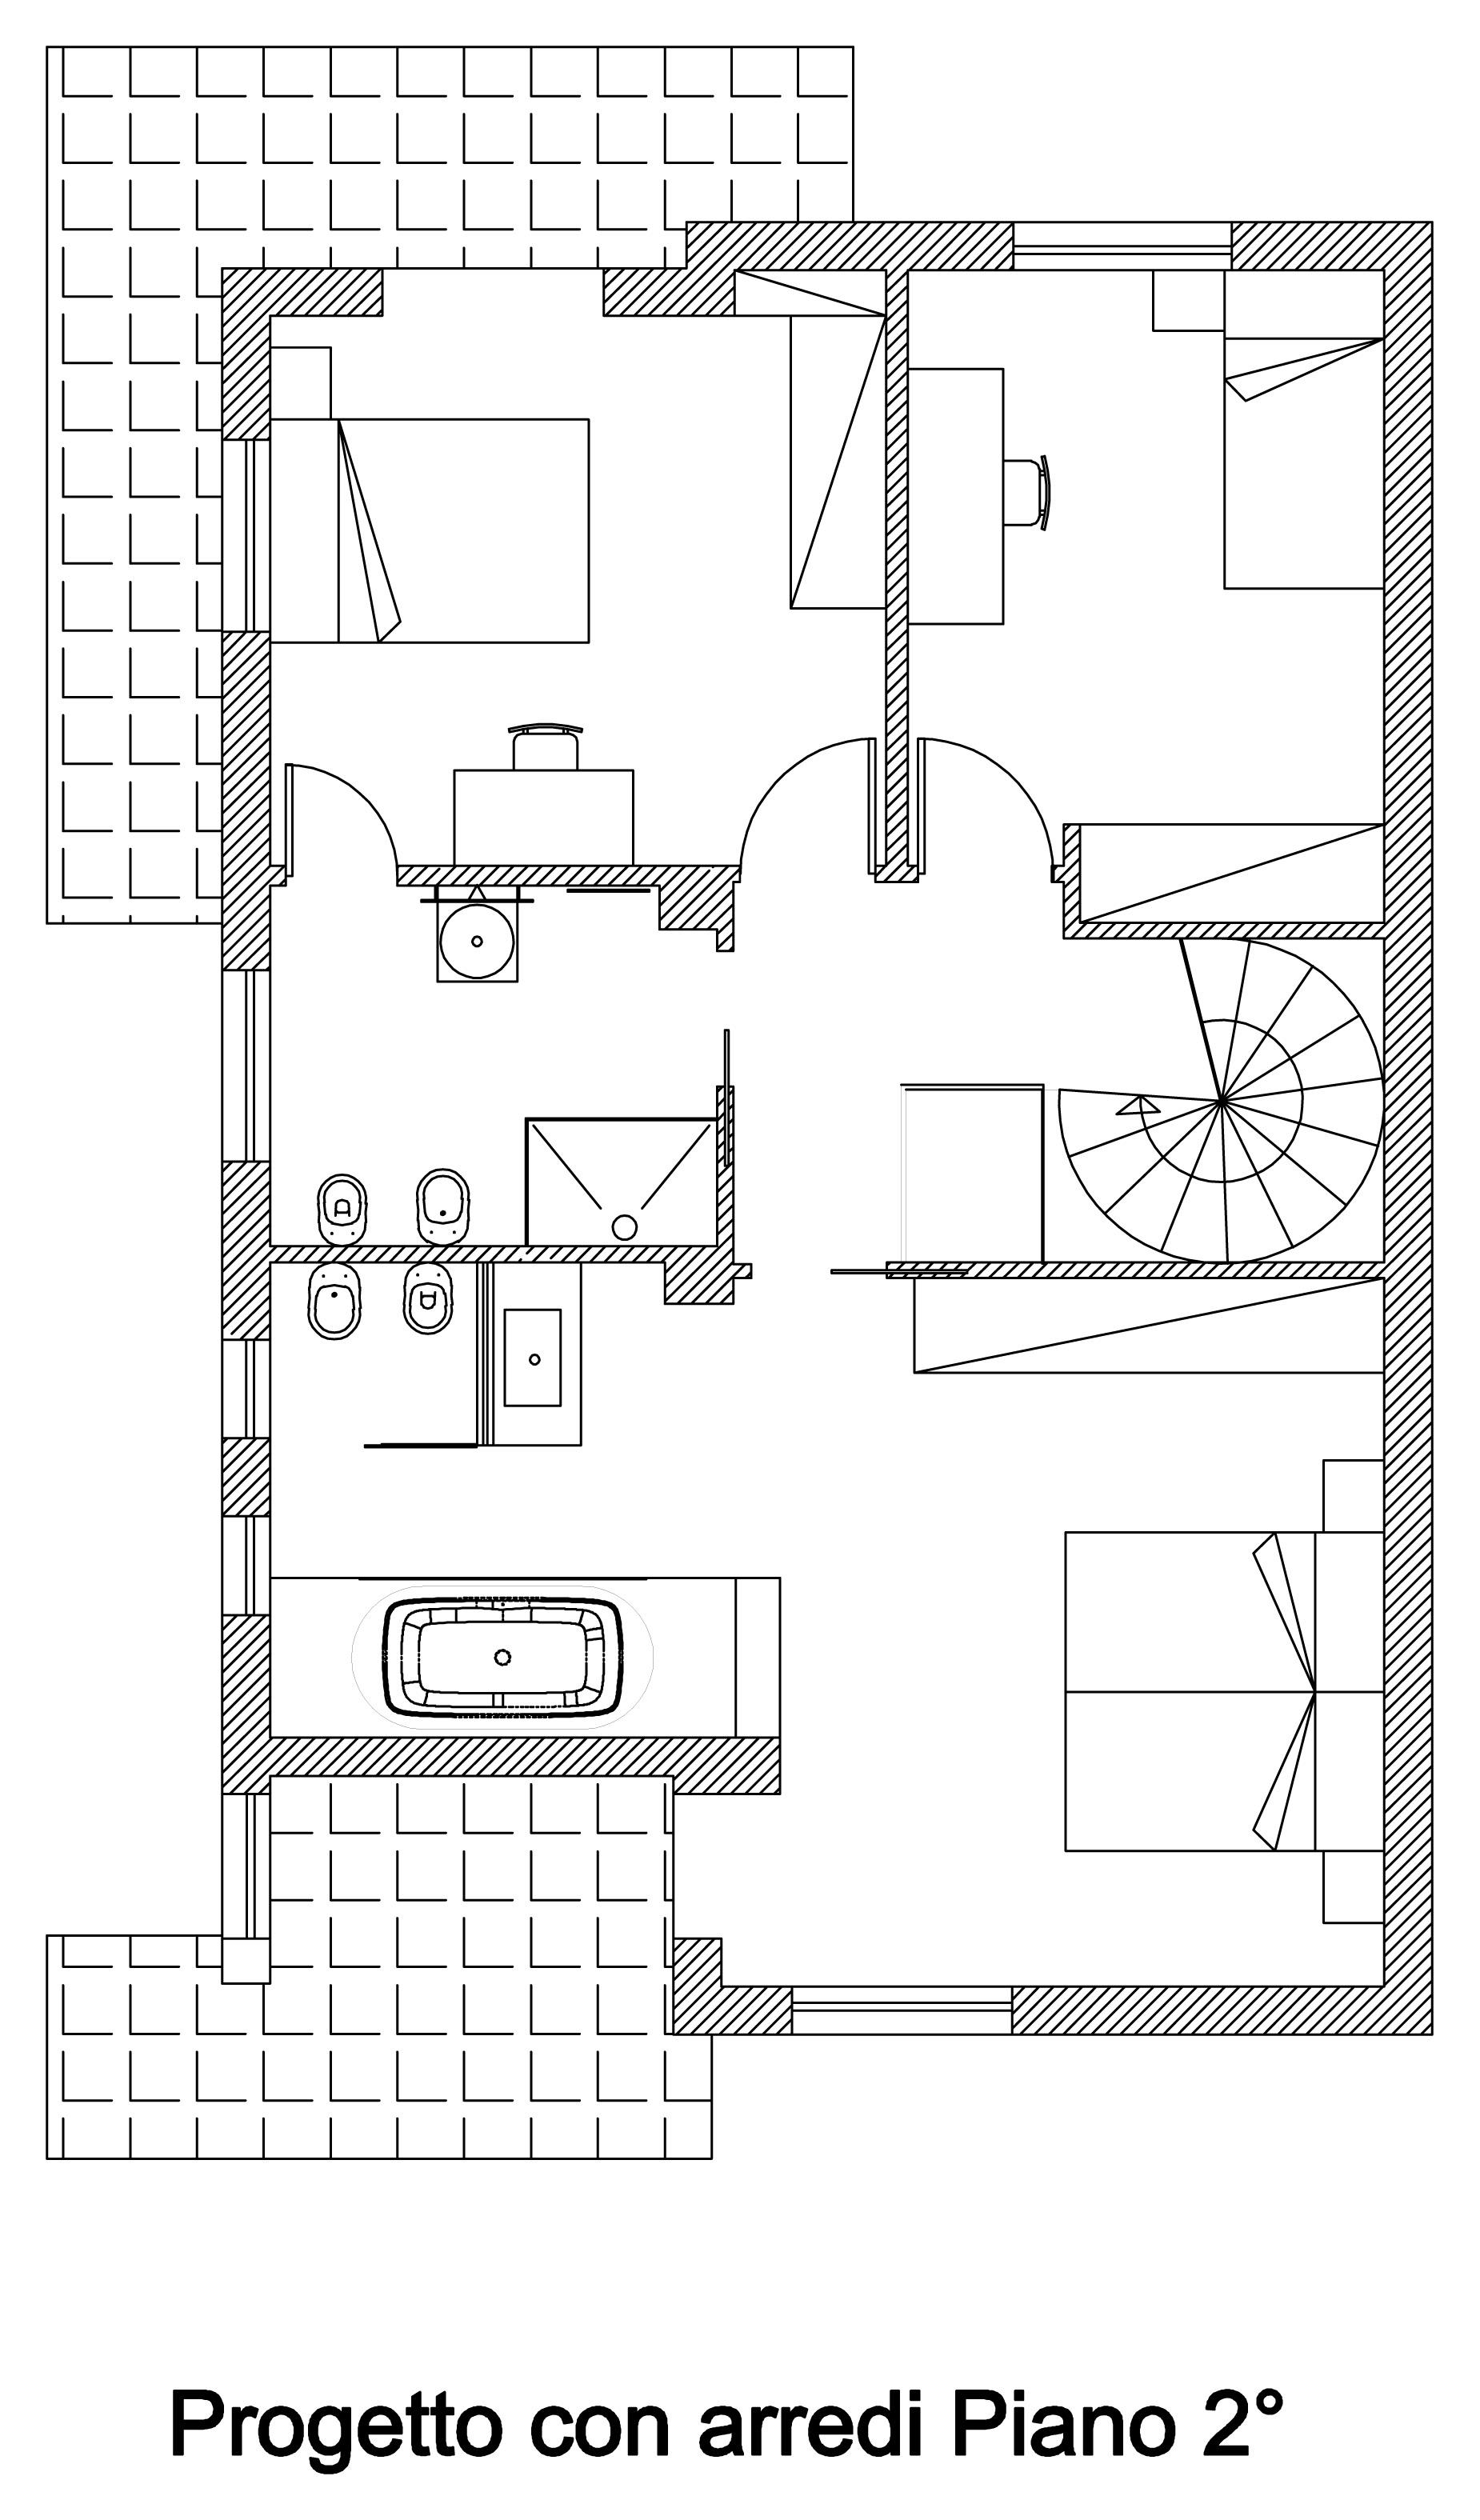 Bogen-arnone-Interieur-Design-of-unabitazione-of-2-Ebenen-Boden-Sekunden